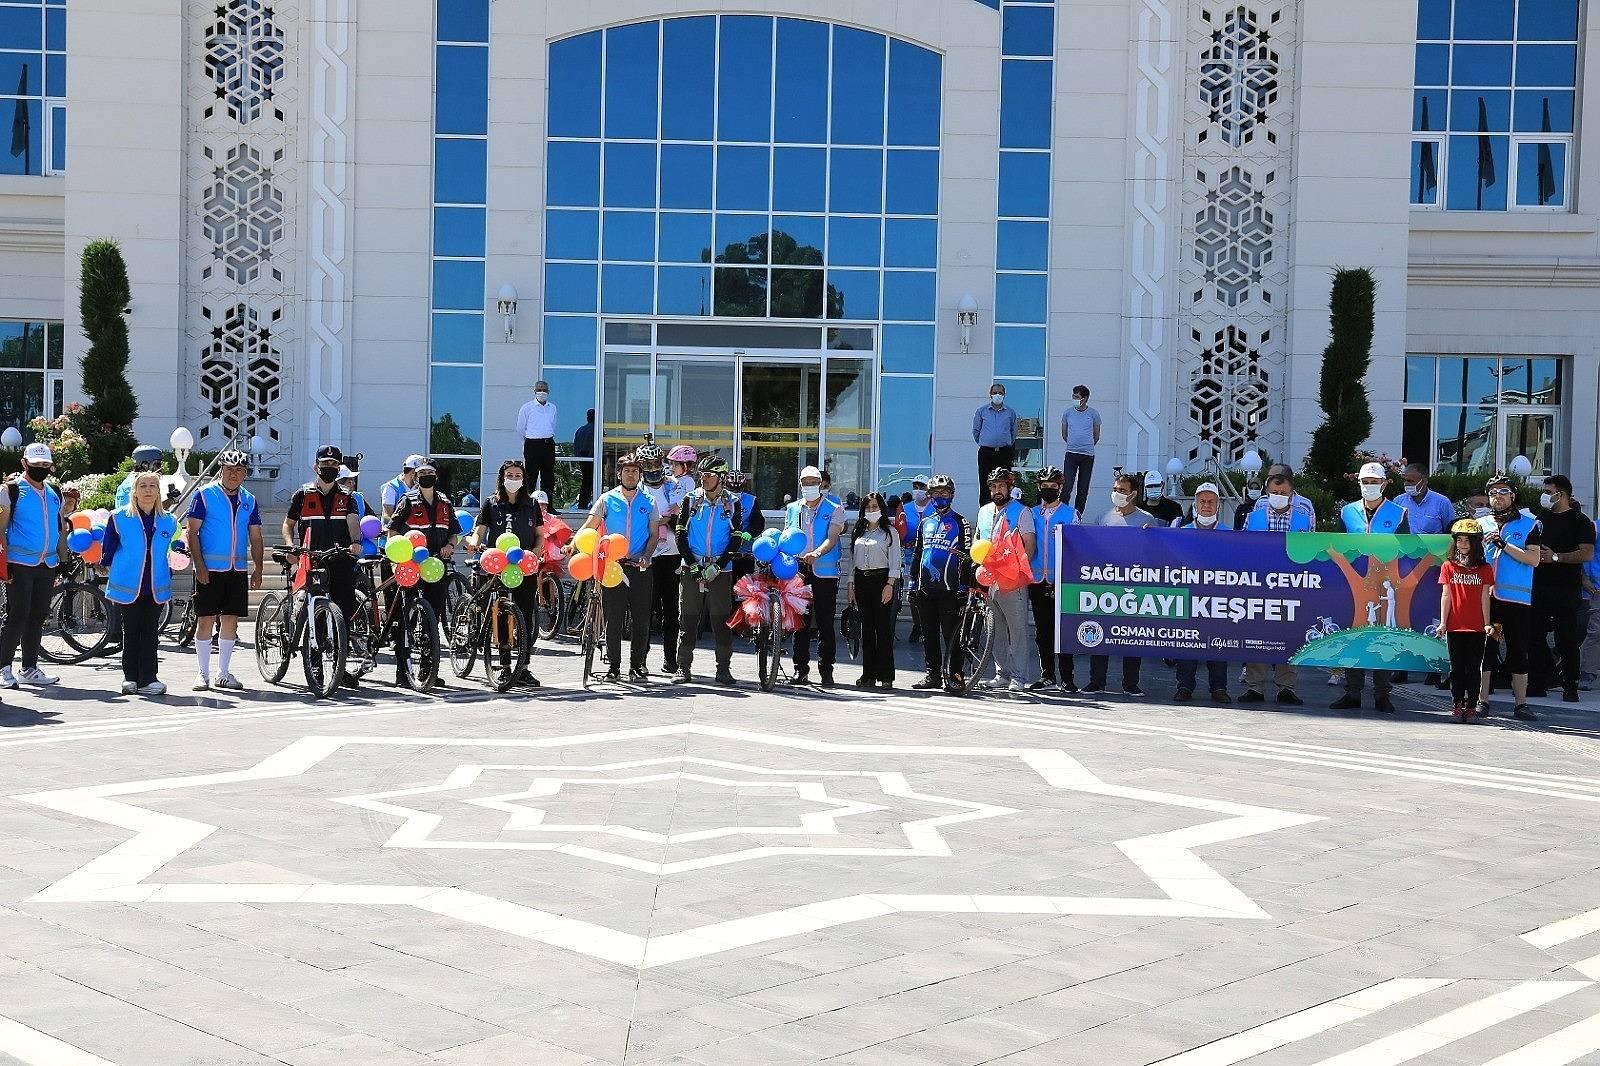 2021/06/battalgazi-belediyesinden-ozel-bisiklet-turu-etkinligi-20210606AW33-1.jpg